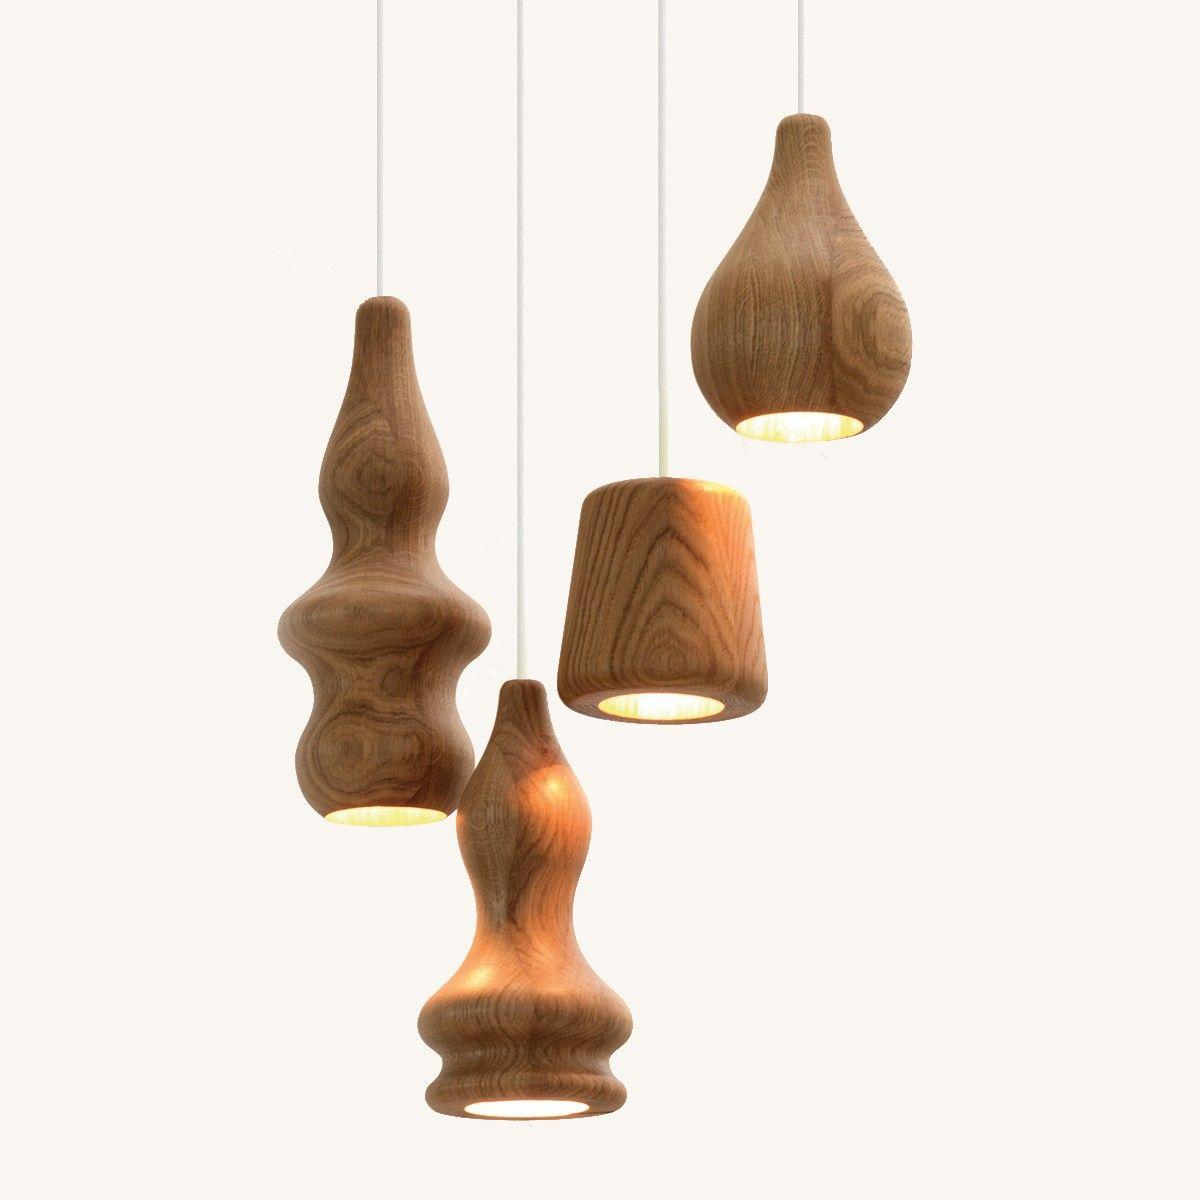 Suspension Design Bois Bulb 1 Lampe Bois Lampes Modernes Suspension Design